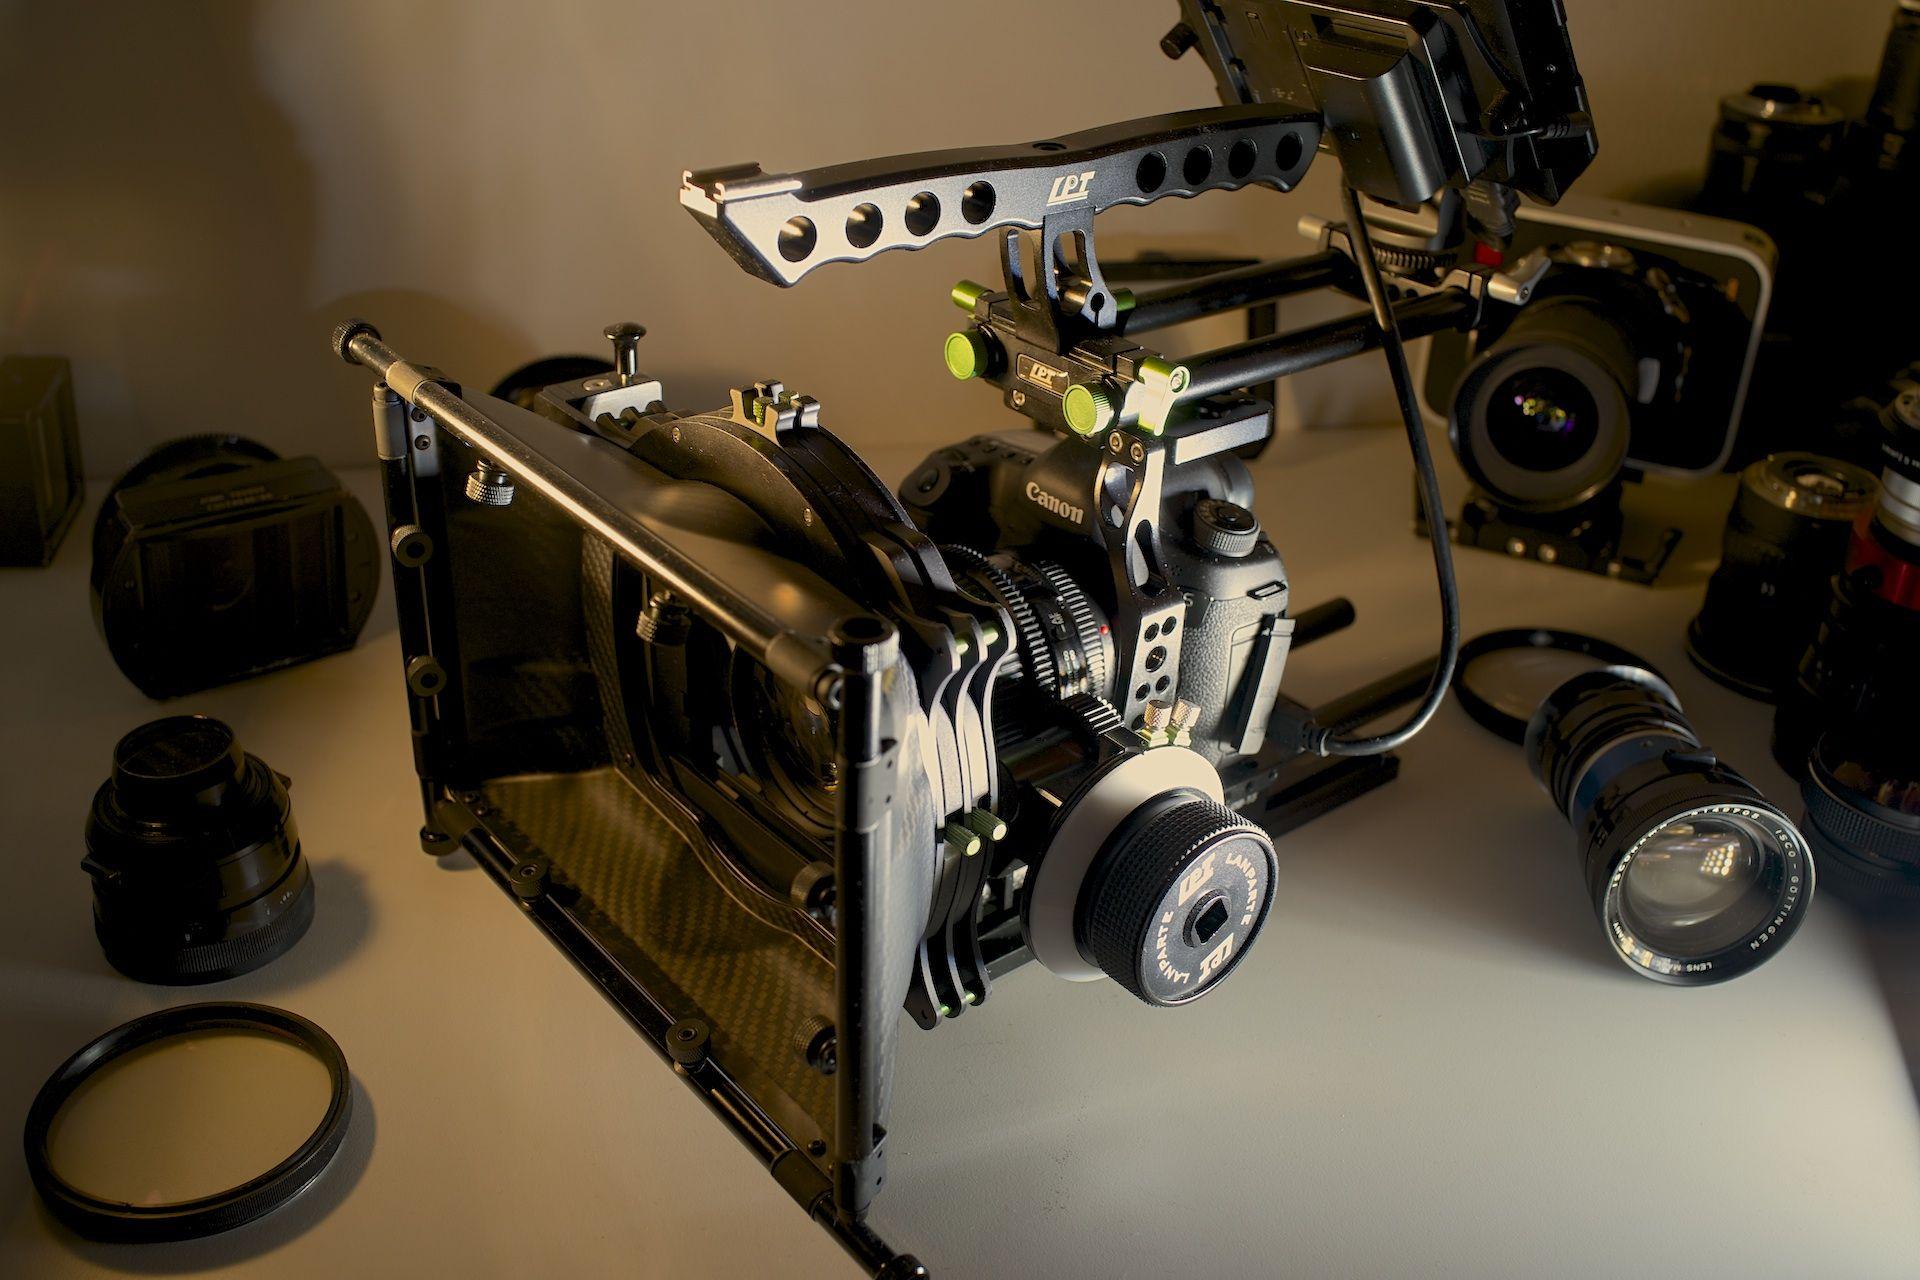 Super 35mm 4k From Canon 5d Mark Iii In New Magic Lantern Module Videography Filmmaking Gear Camera Reviews Magic Lantern